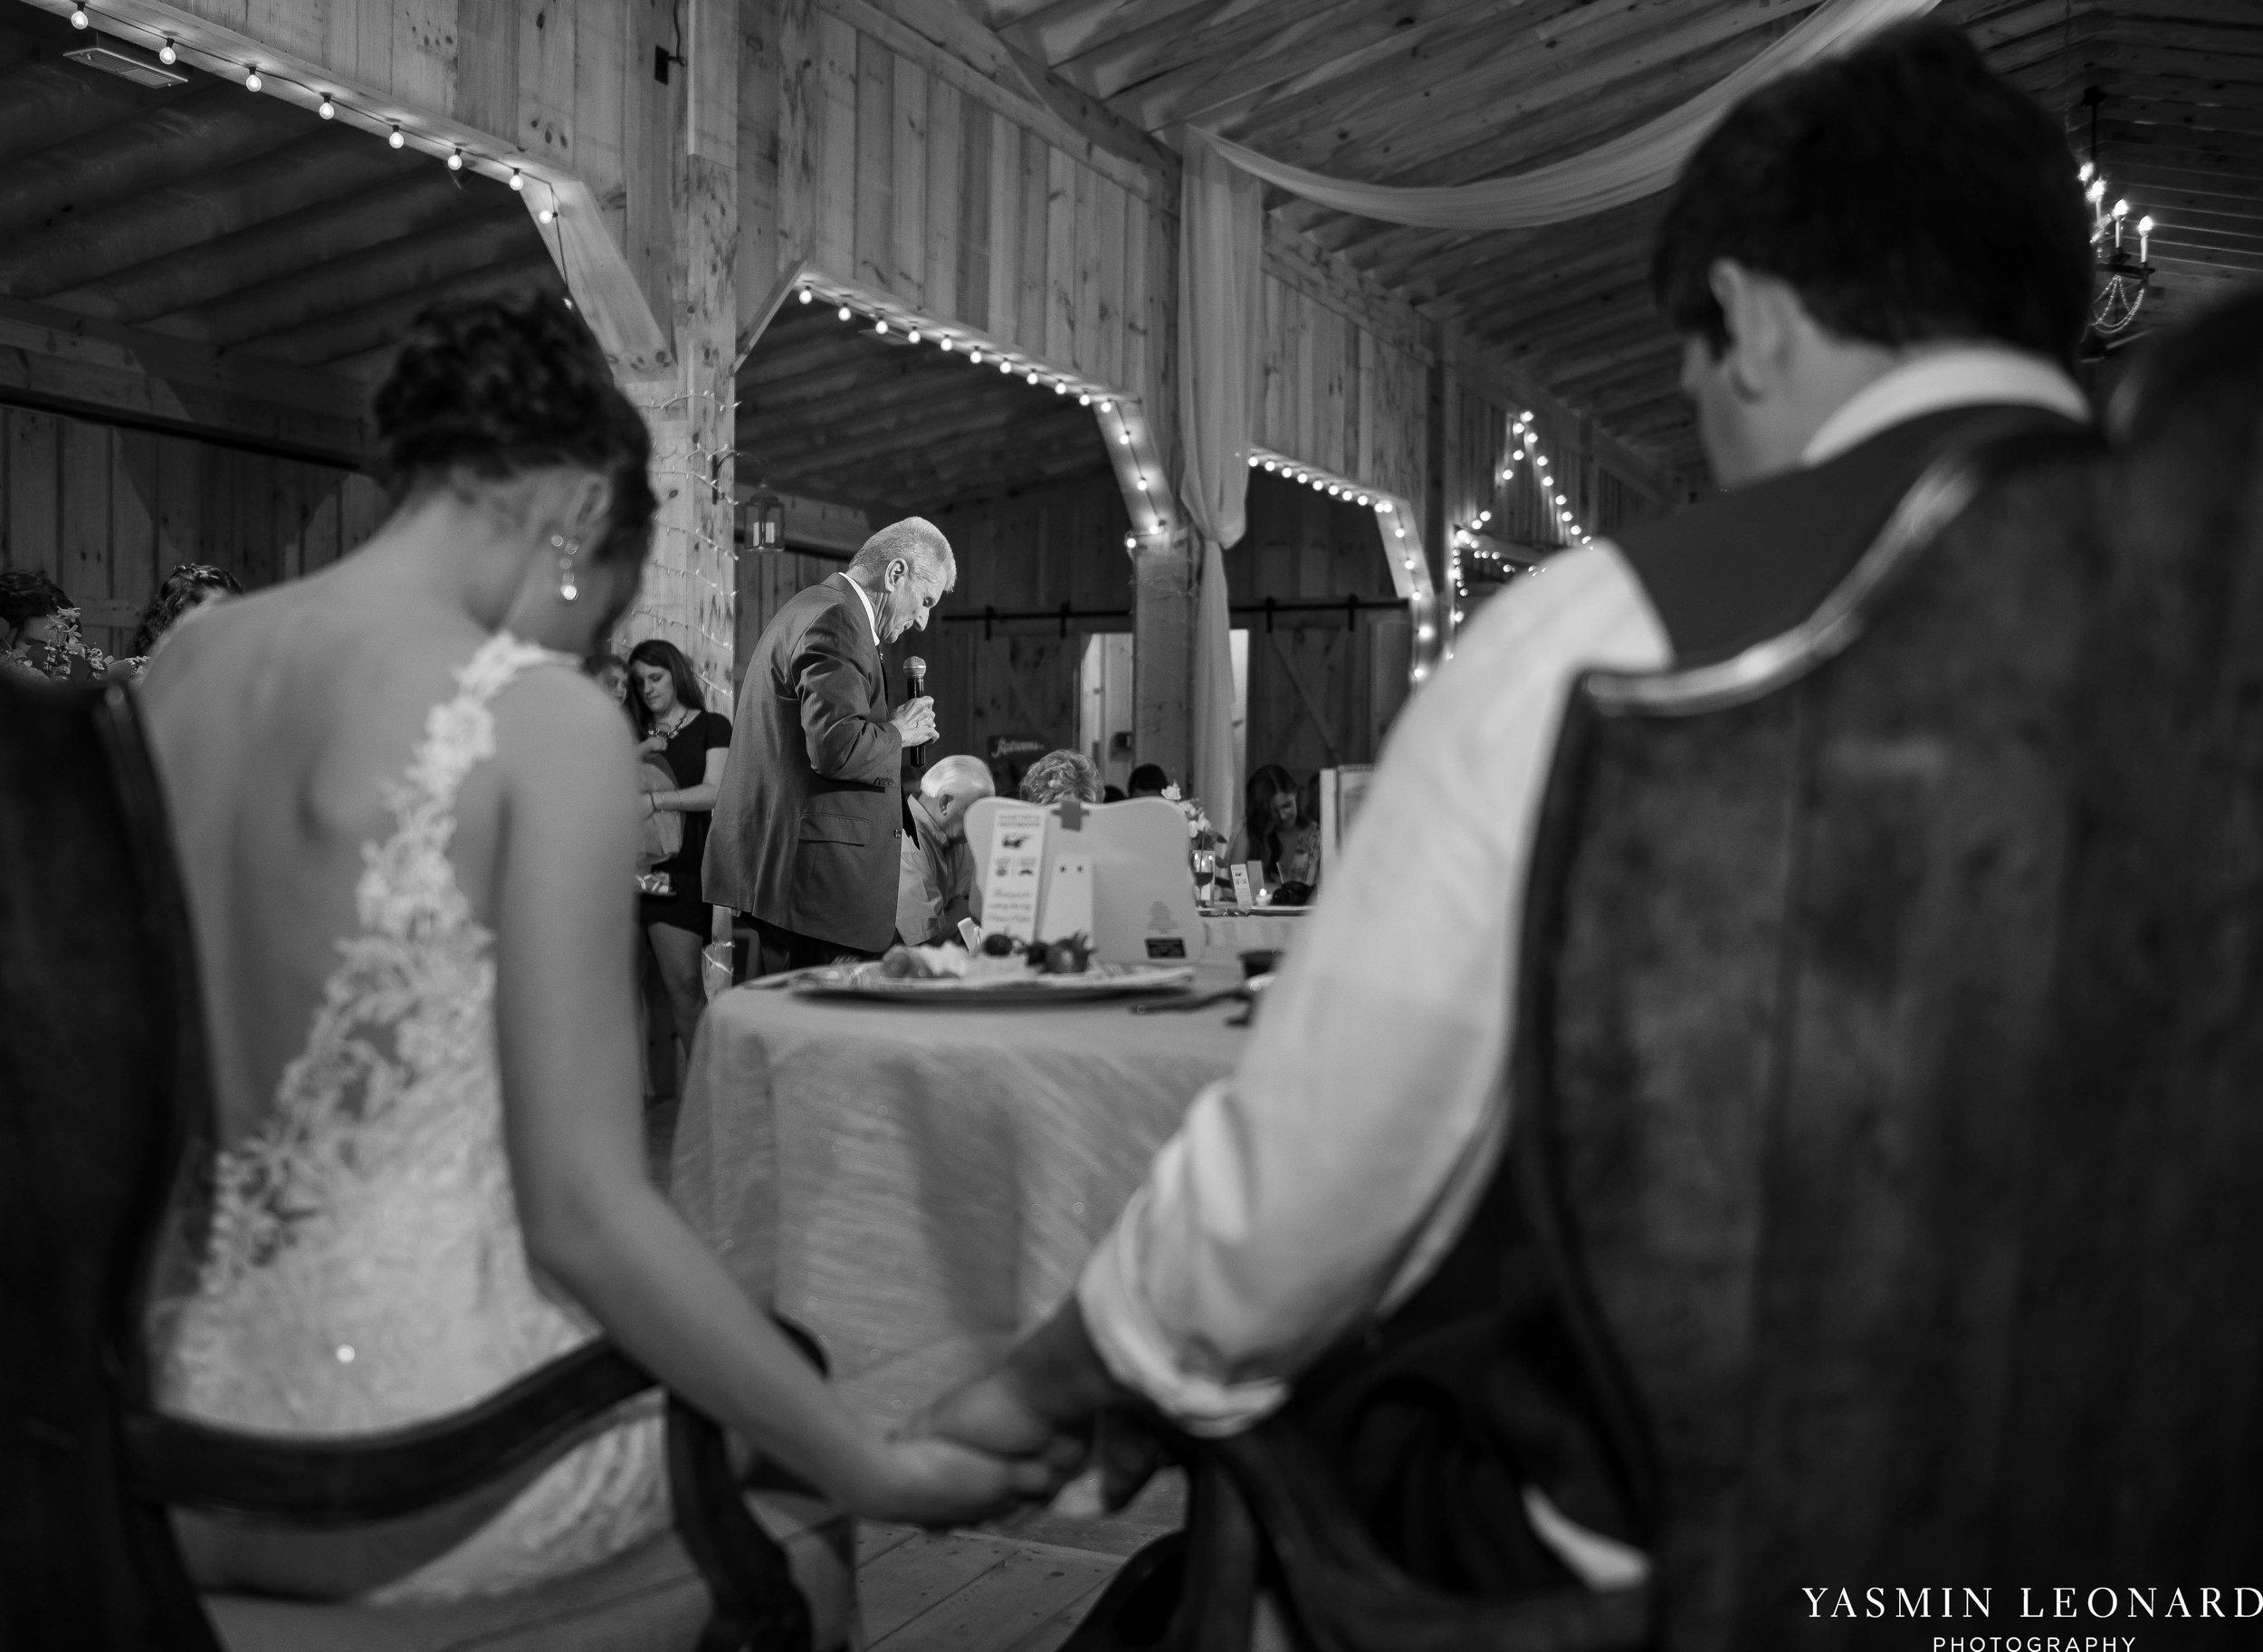 Old Homeplace Vineyard - NC Weddings - Outdoor Summer Weddings - Peony Boutique - Vineyard Wedding - NC Photographer - Yasmin Leonard Photography-53.jpg